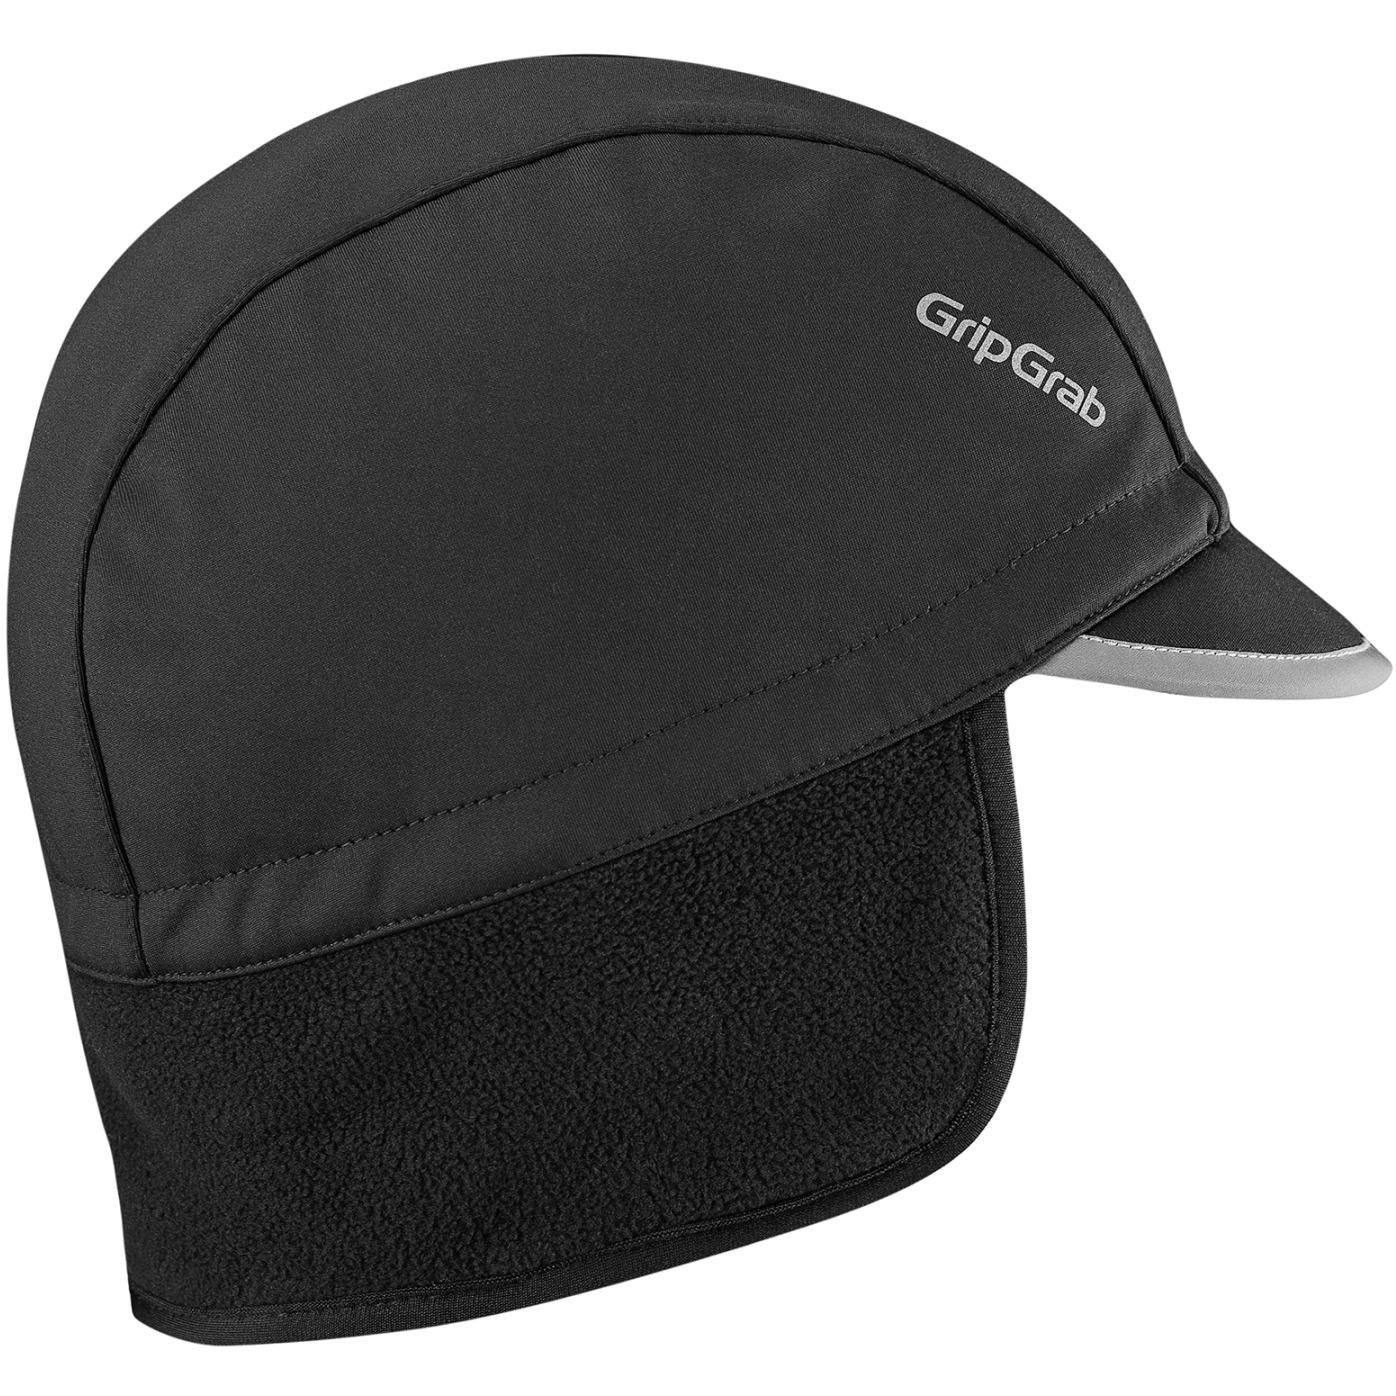 GripGrab Windproof Winter Cycling Cap - Black